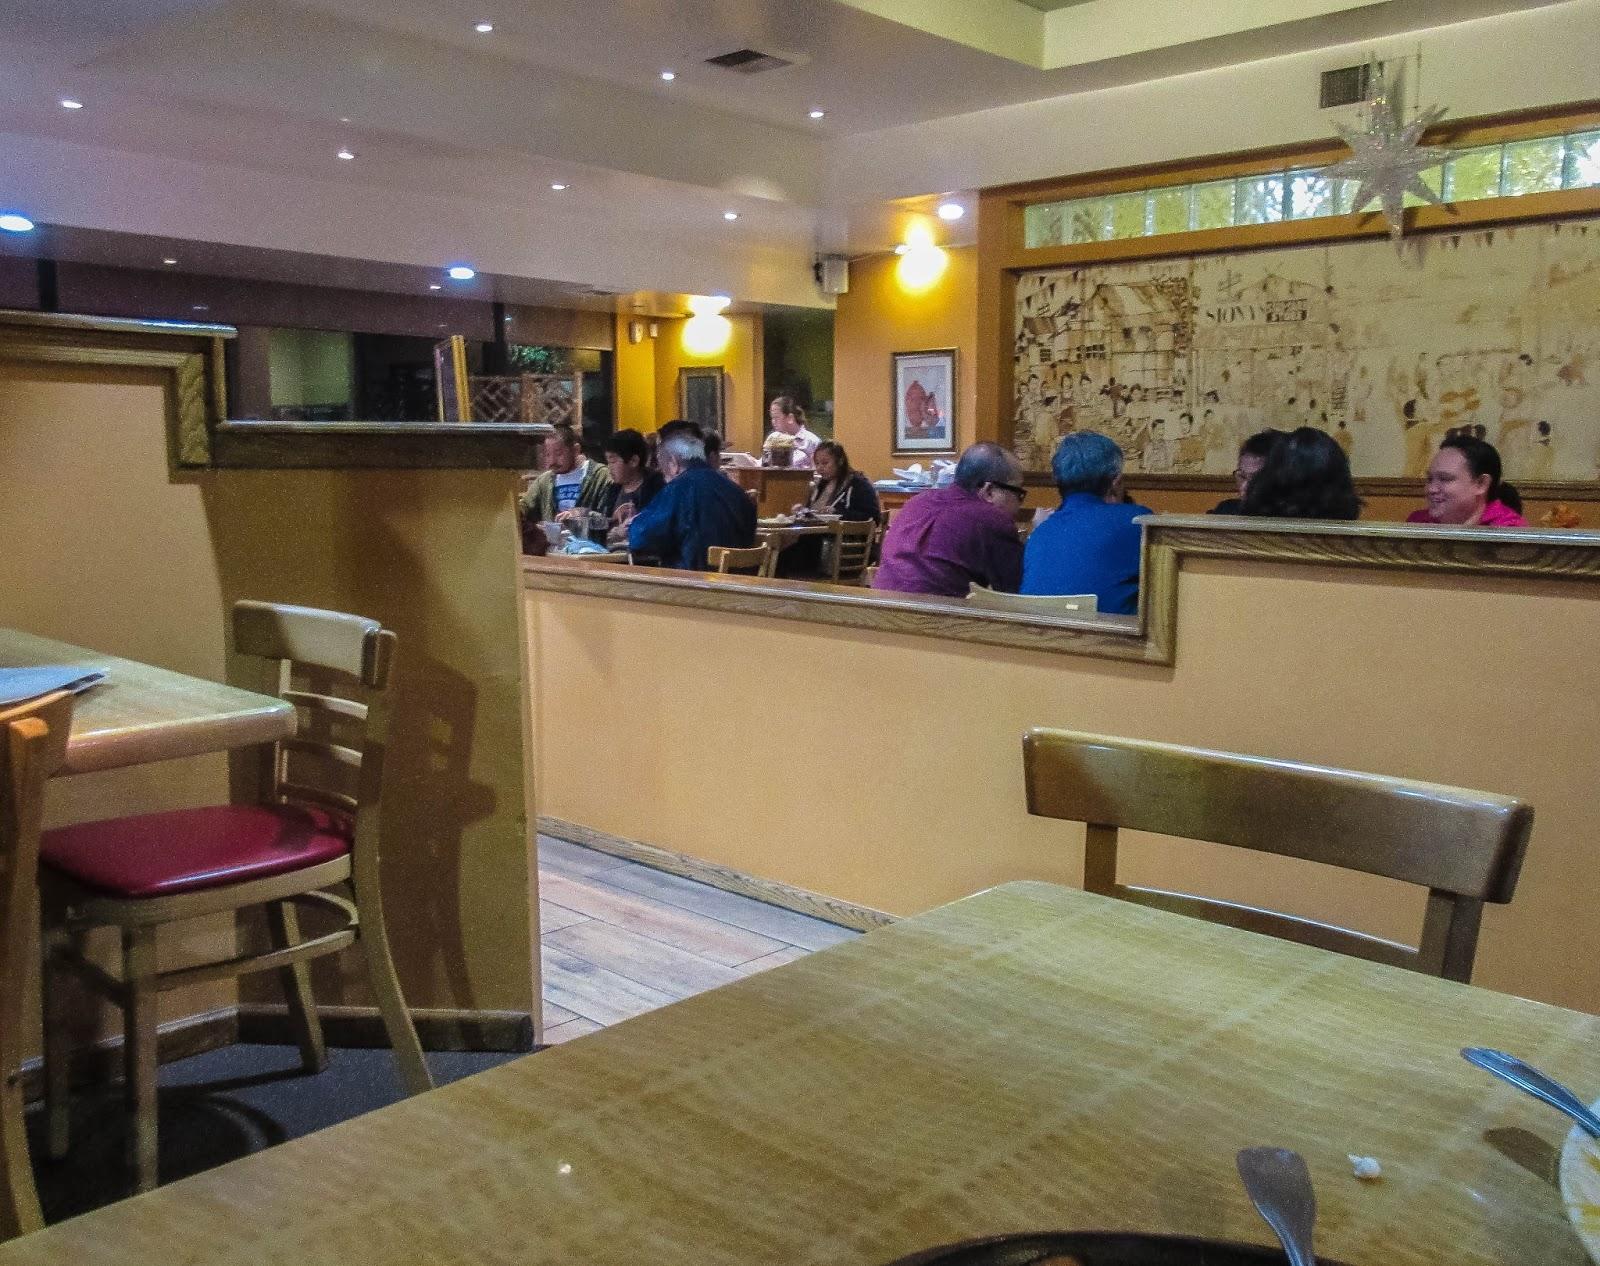 Salo Salo Restaurant In West Covina